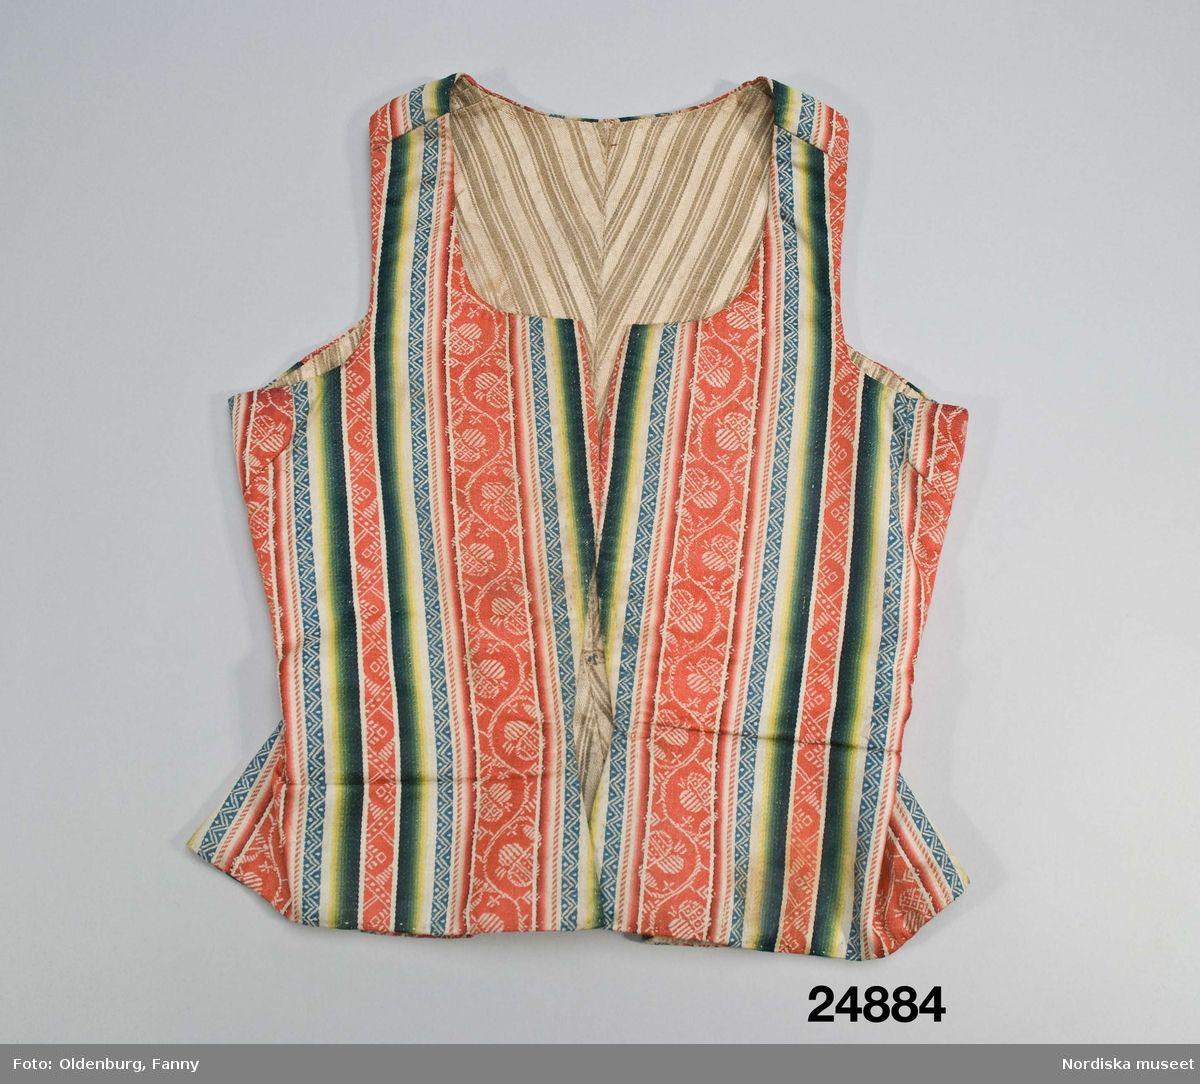 2f4d92e45e81 Livstycke @ DigitaltMuseum.se   1700-tal   Sweden, Folk costume och Tops